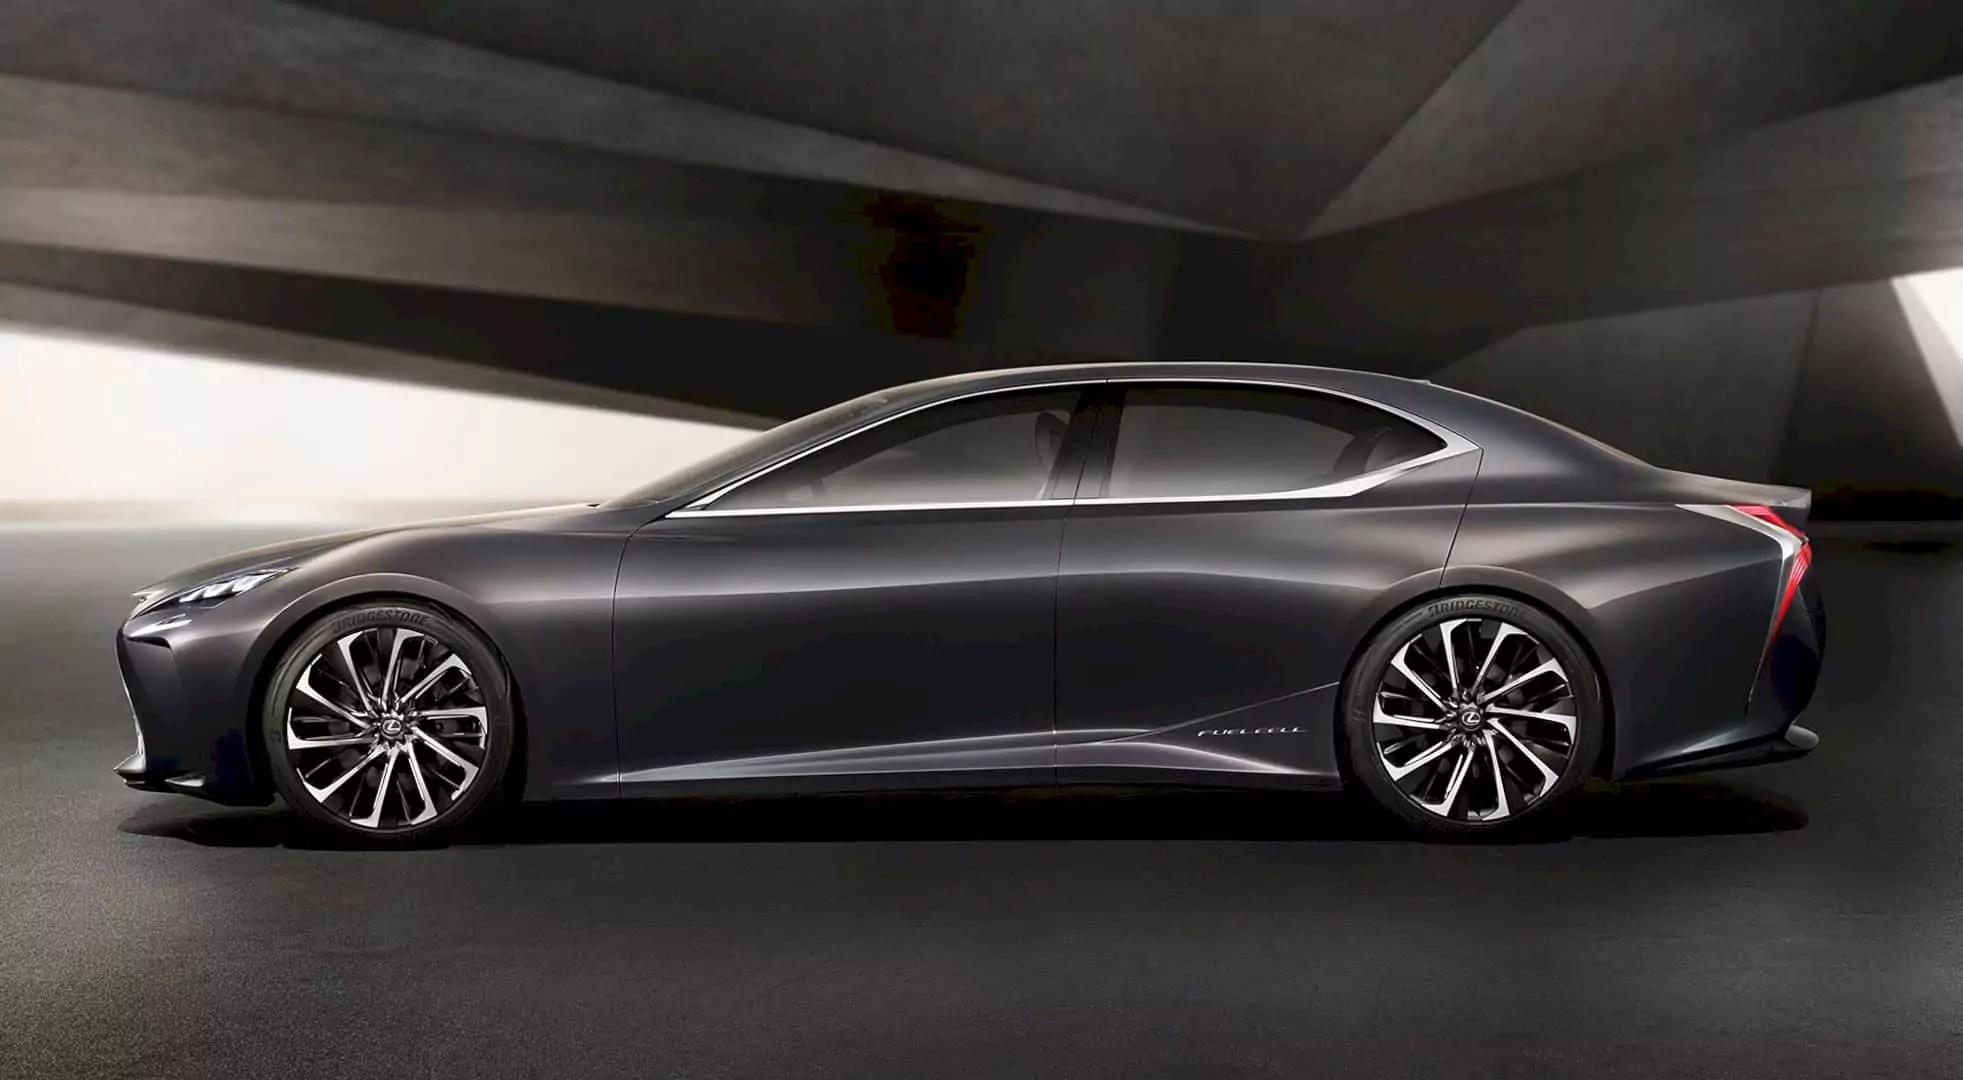 """Fueling the Unexpected"" - Lexus LF FC Concept Car"